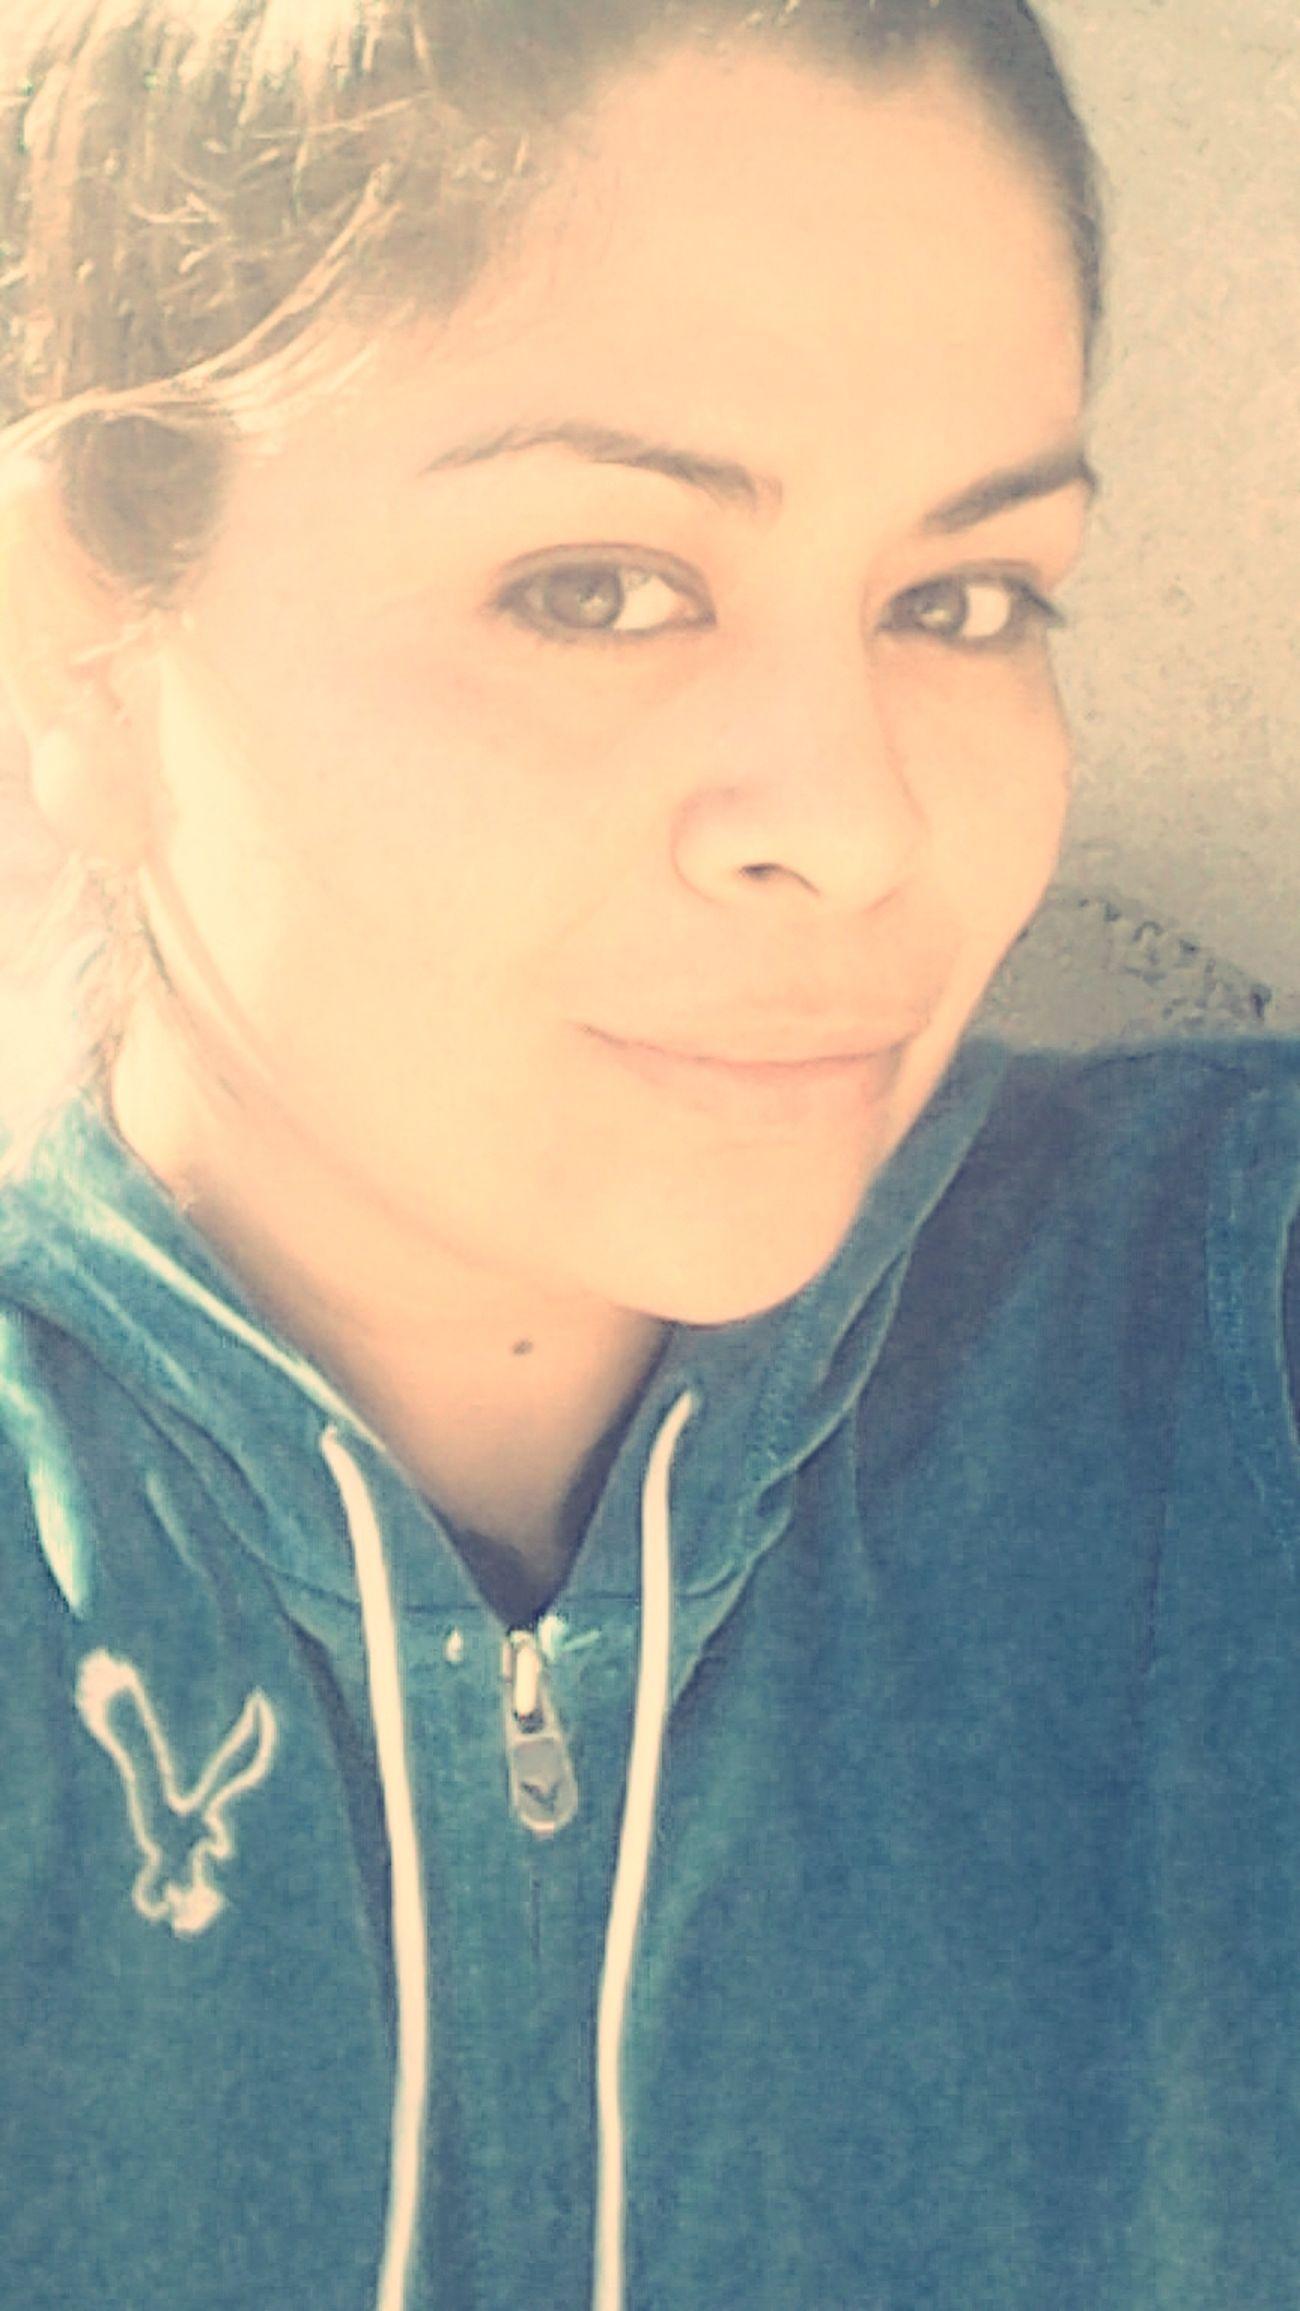 Aburrida ❤✌ That's Me Hello World Sad :(